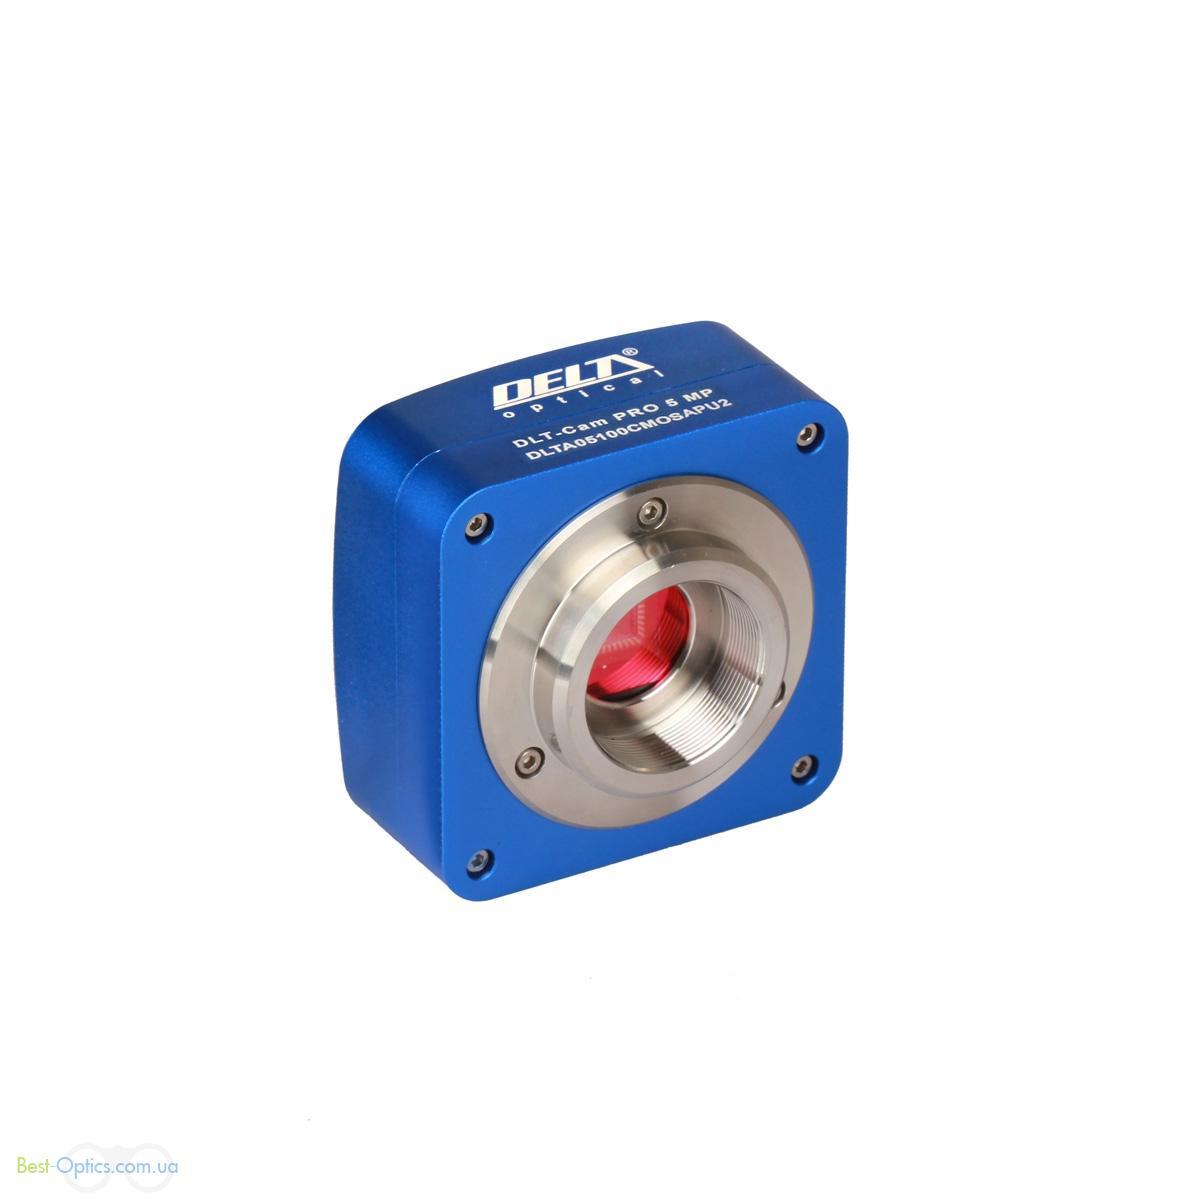 Цифровая камера Delta Optical DLT-Cam PRO 5MP USB 3.0